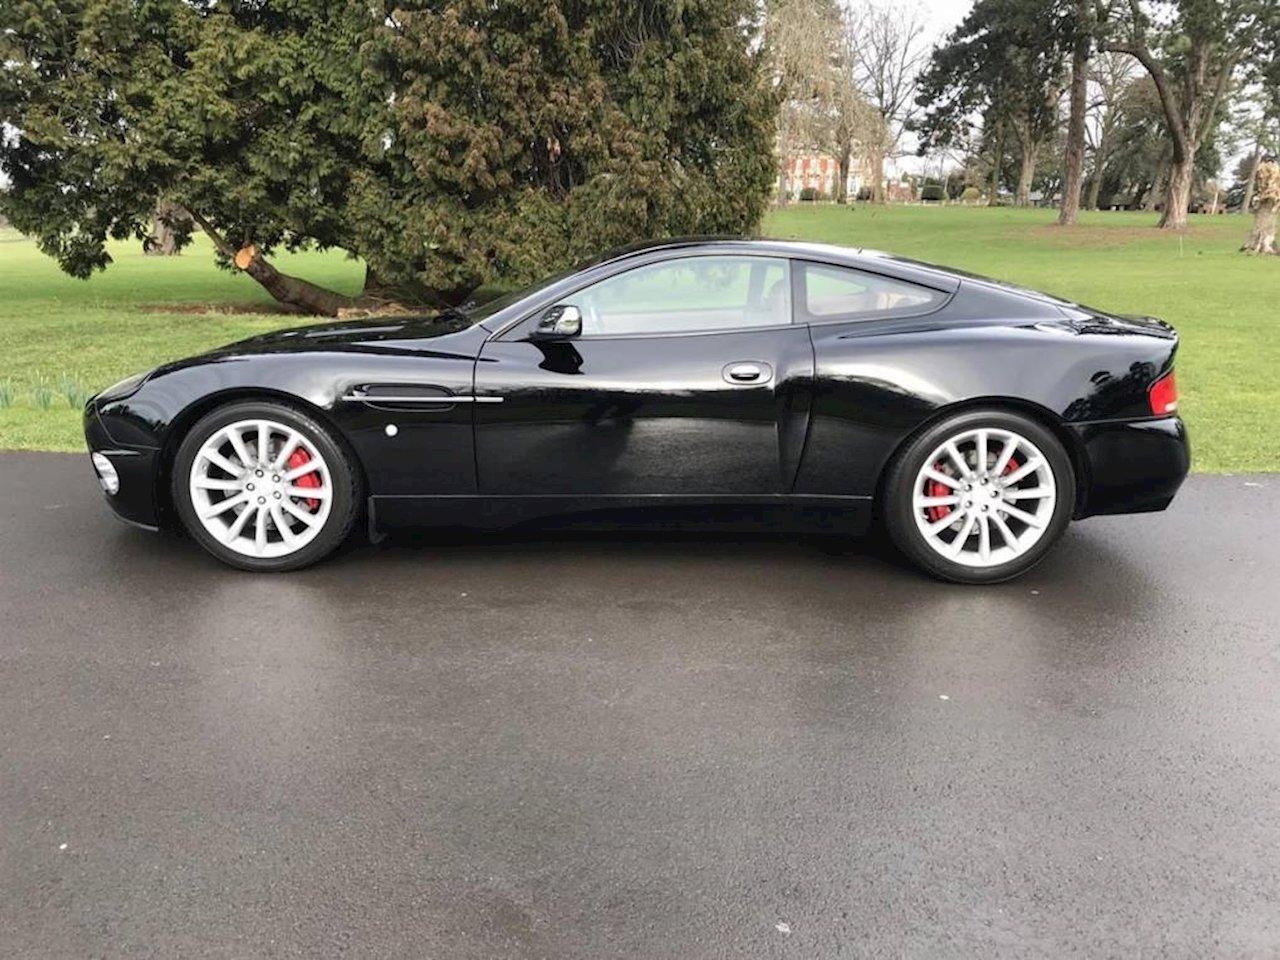 2004 Aston Martin Vanquish - 2002 - Jet Black  For Sale (picture 3 of 5)